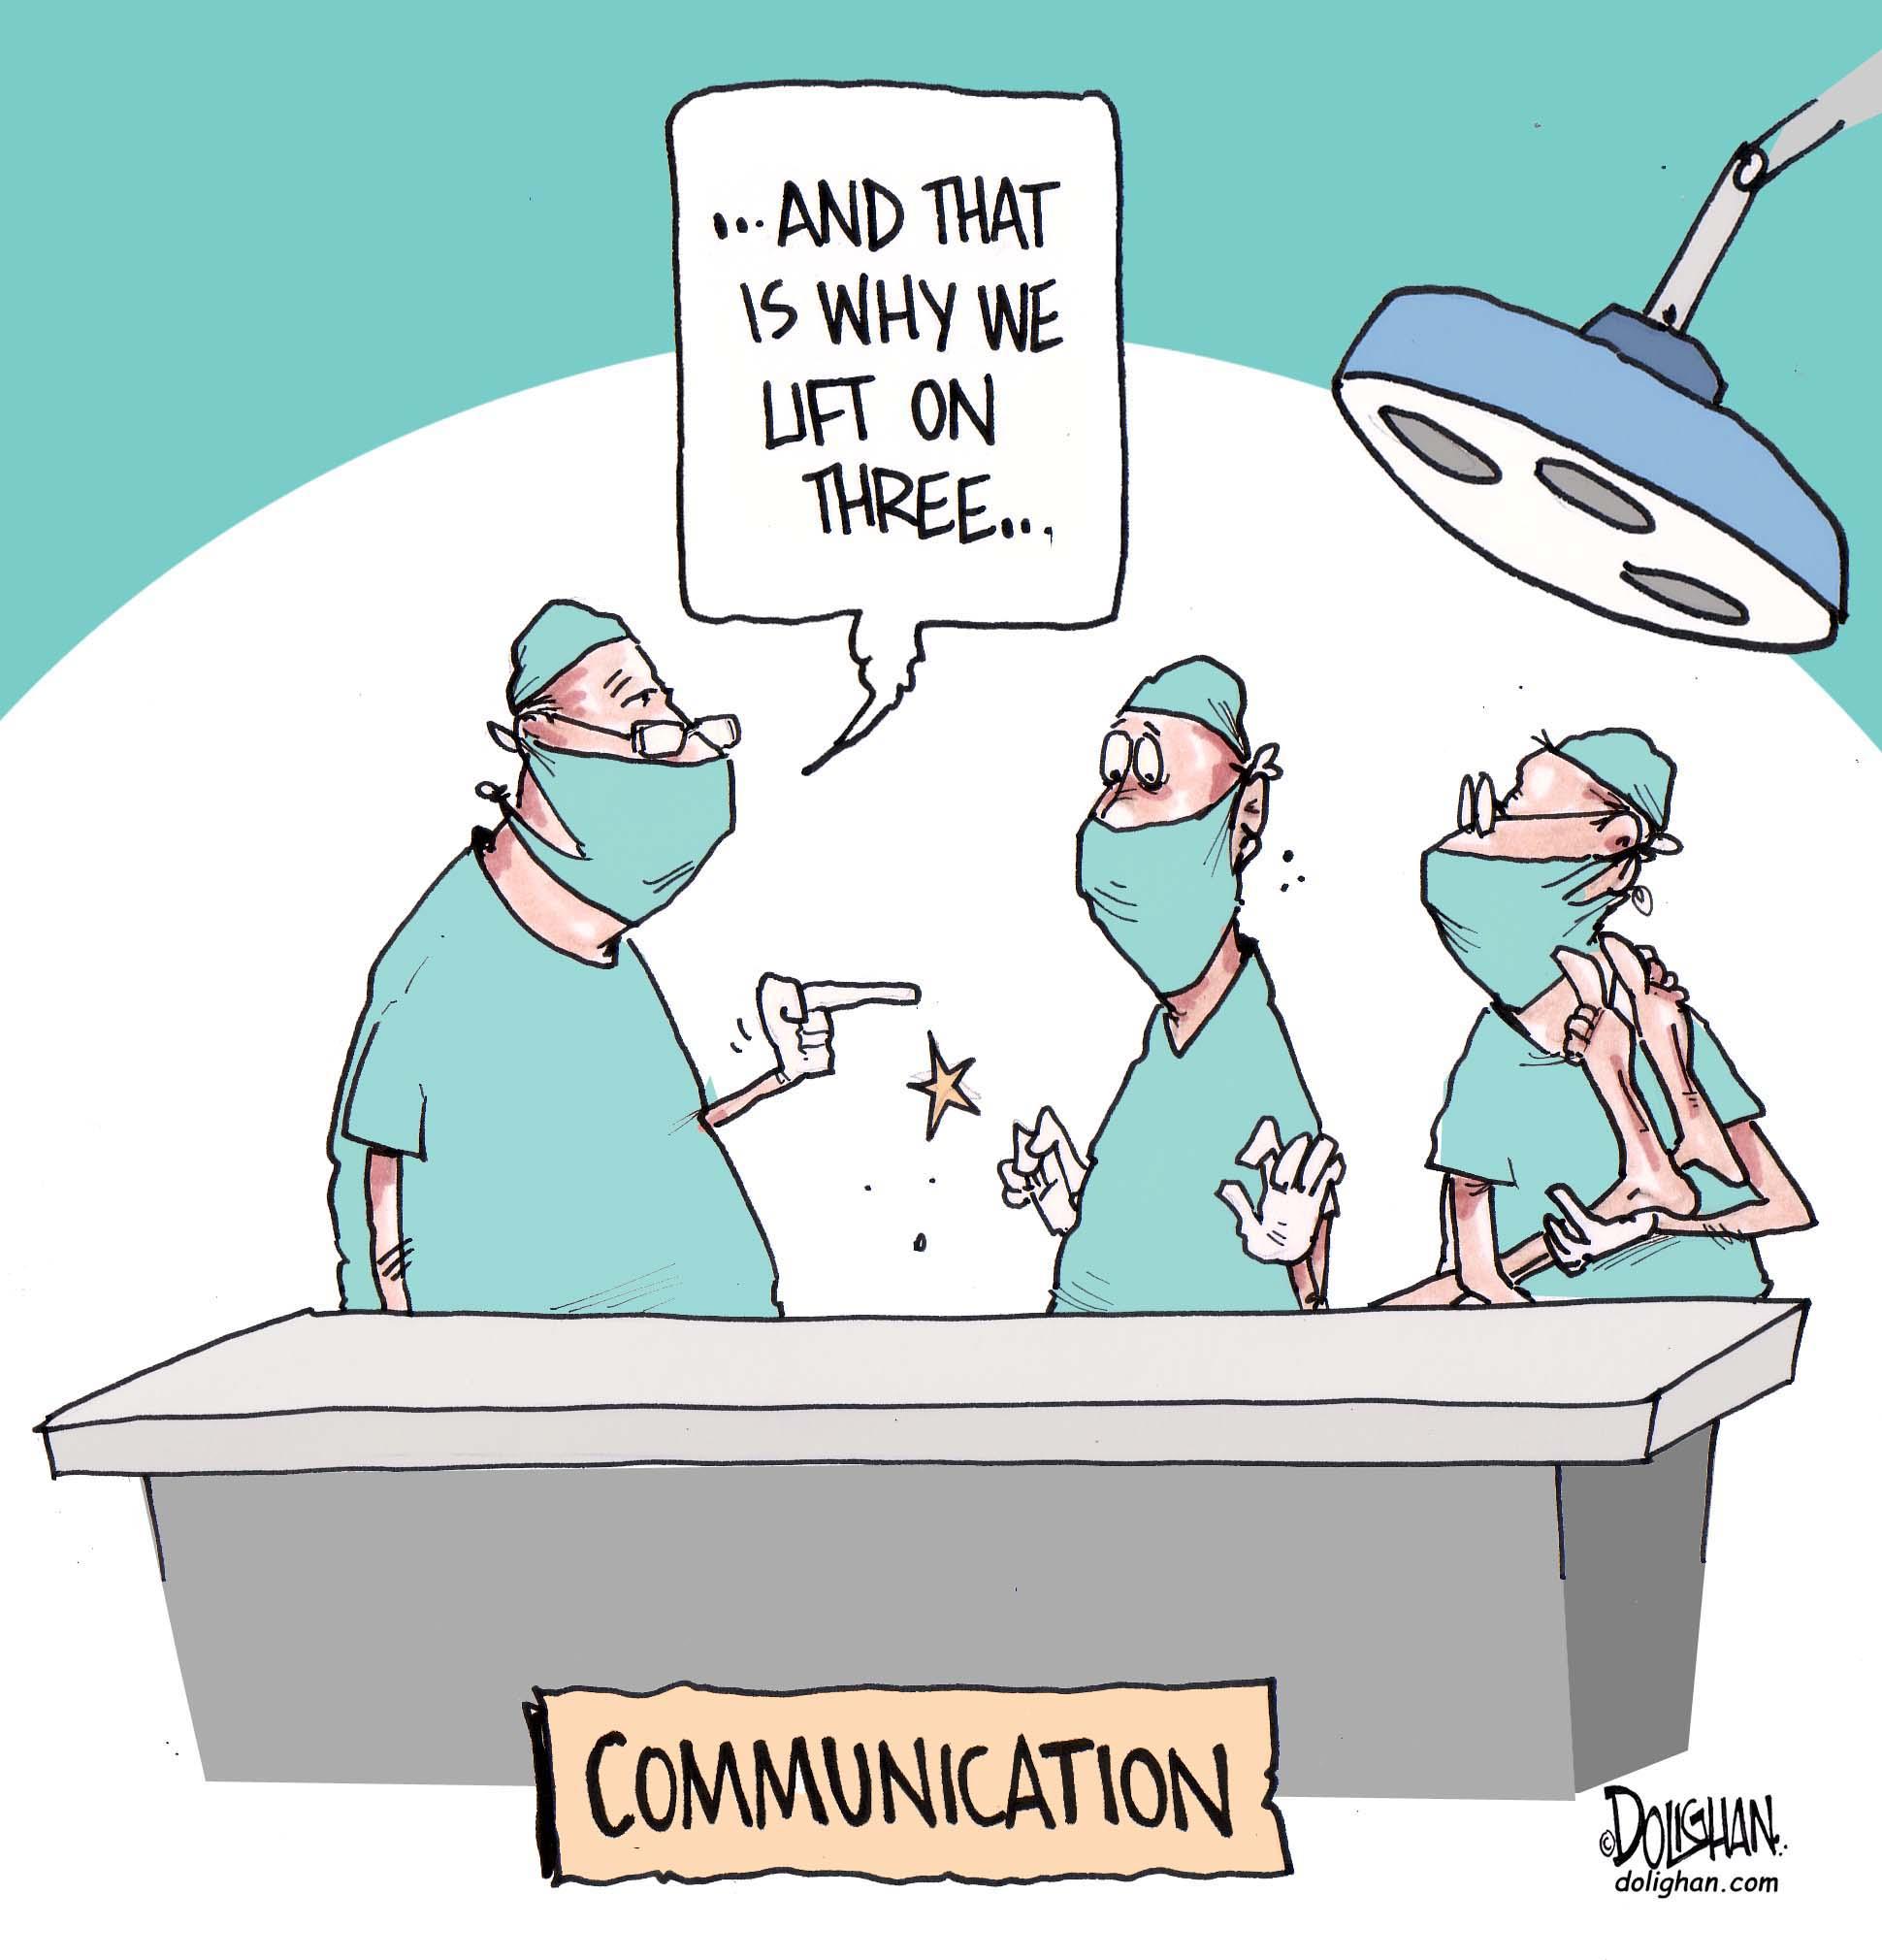 Communication-Cartoon-Dolighan.jpeg